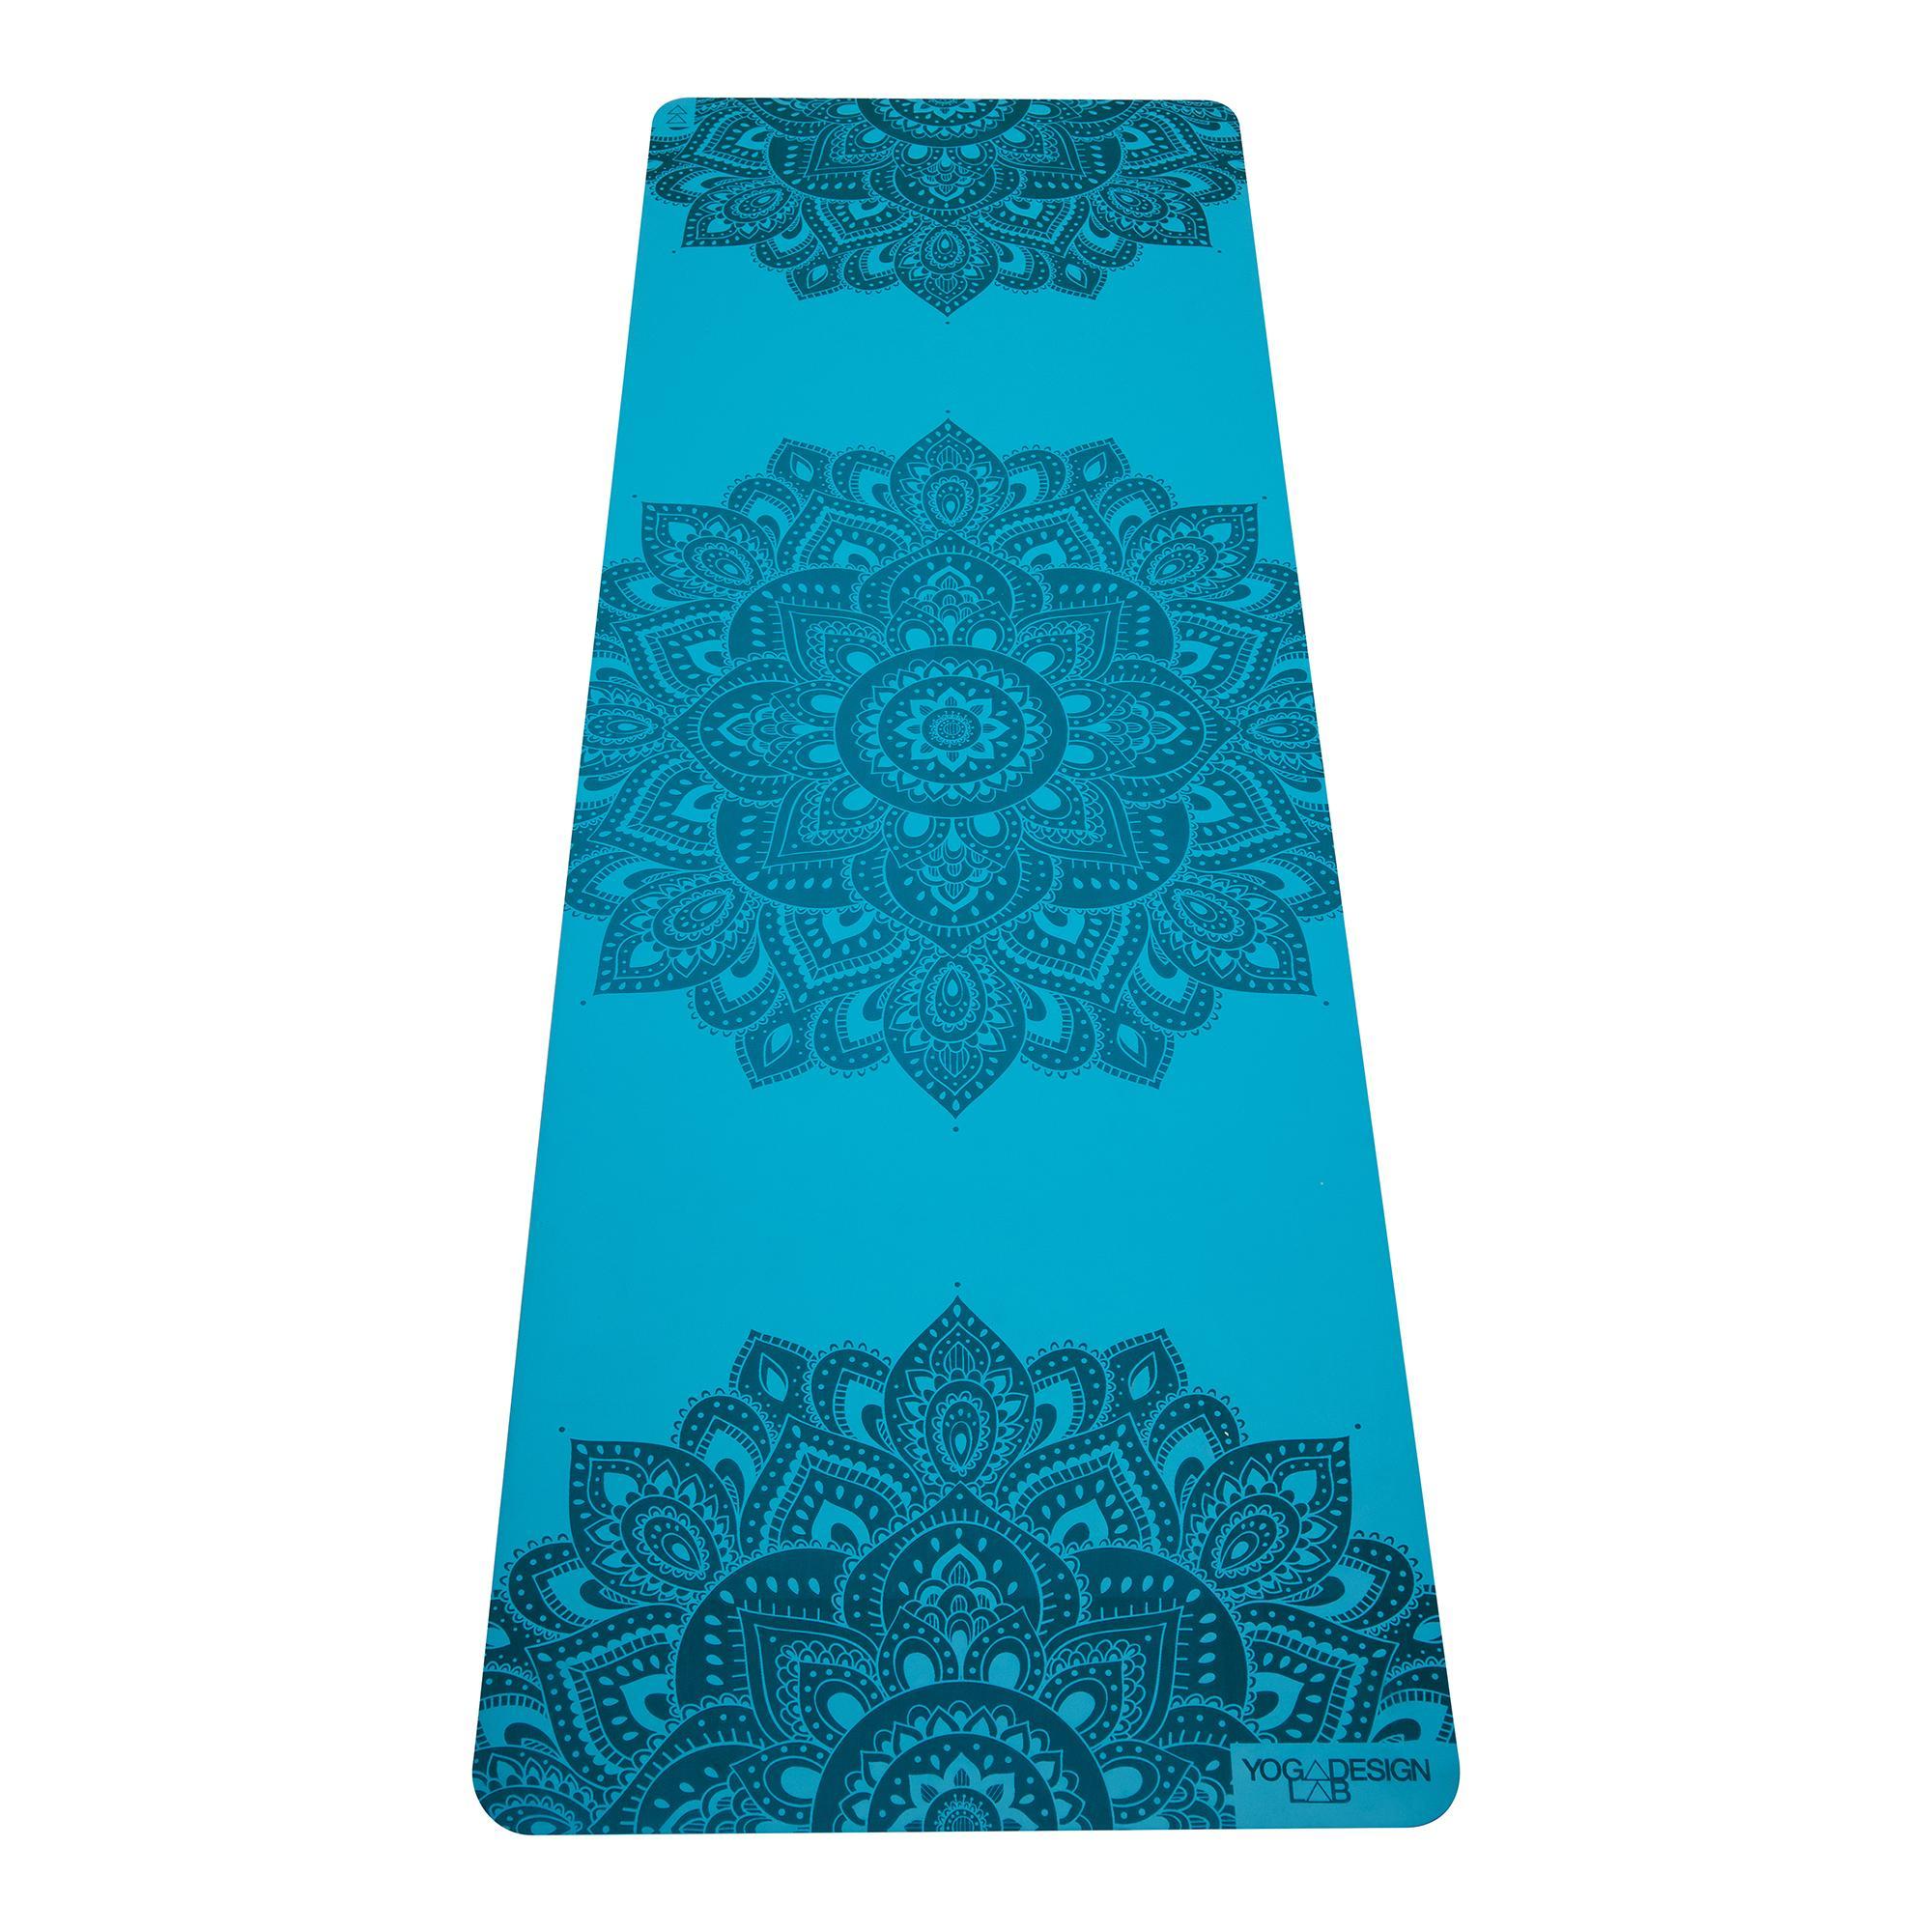 5.0mm Infinity Yoga Mat - Mandala Aqua